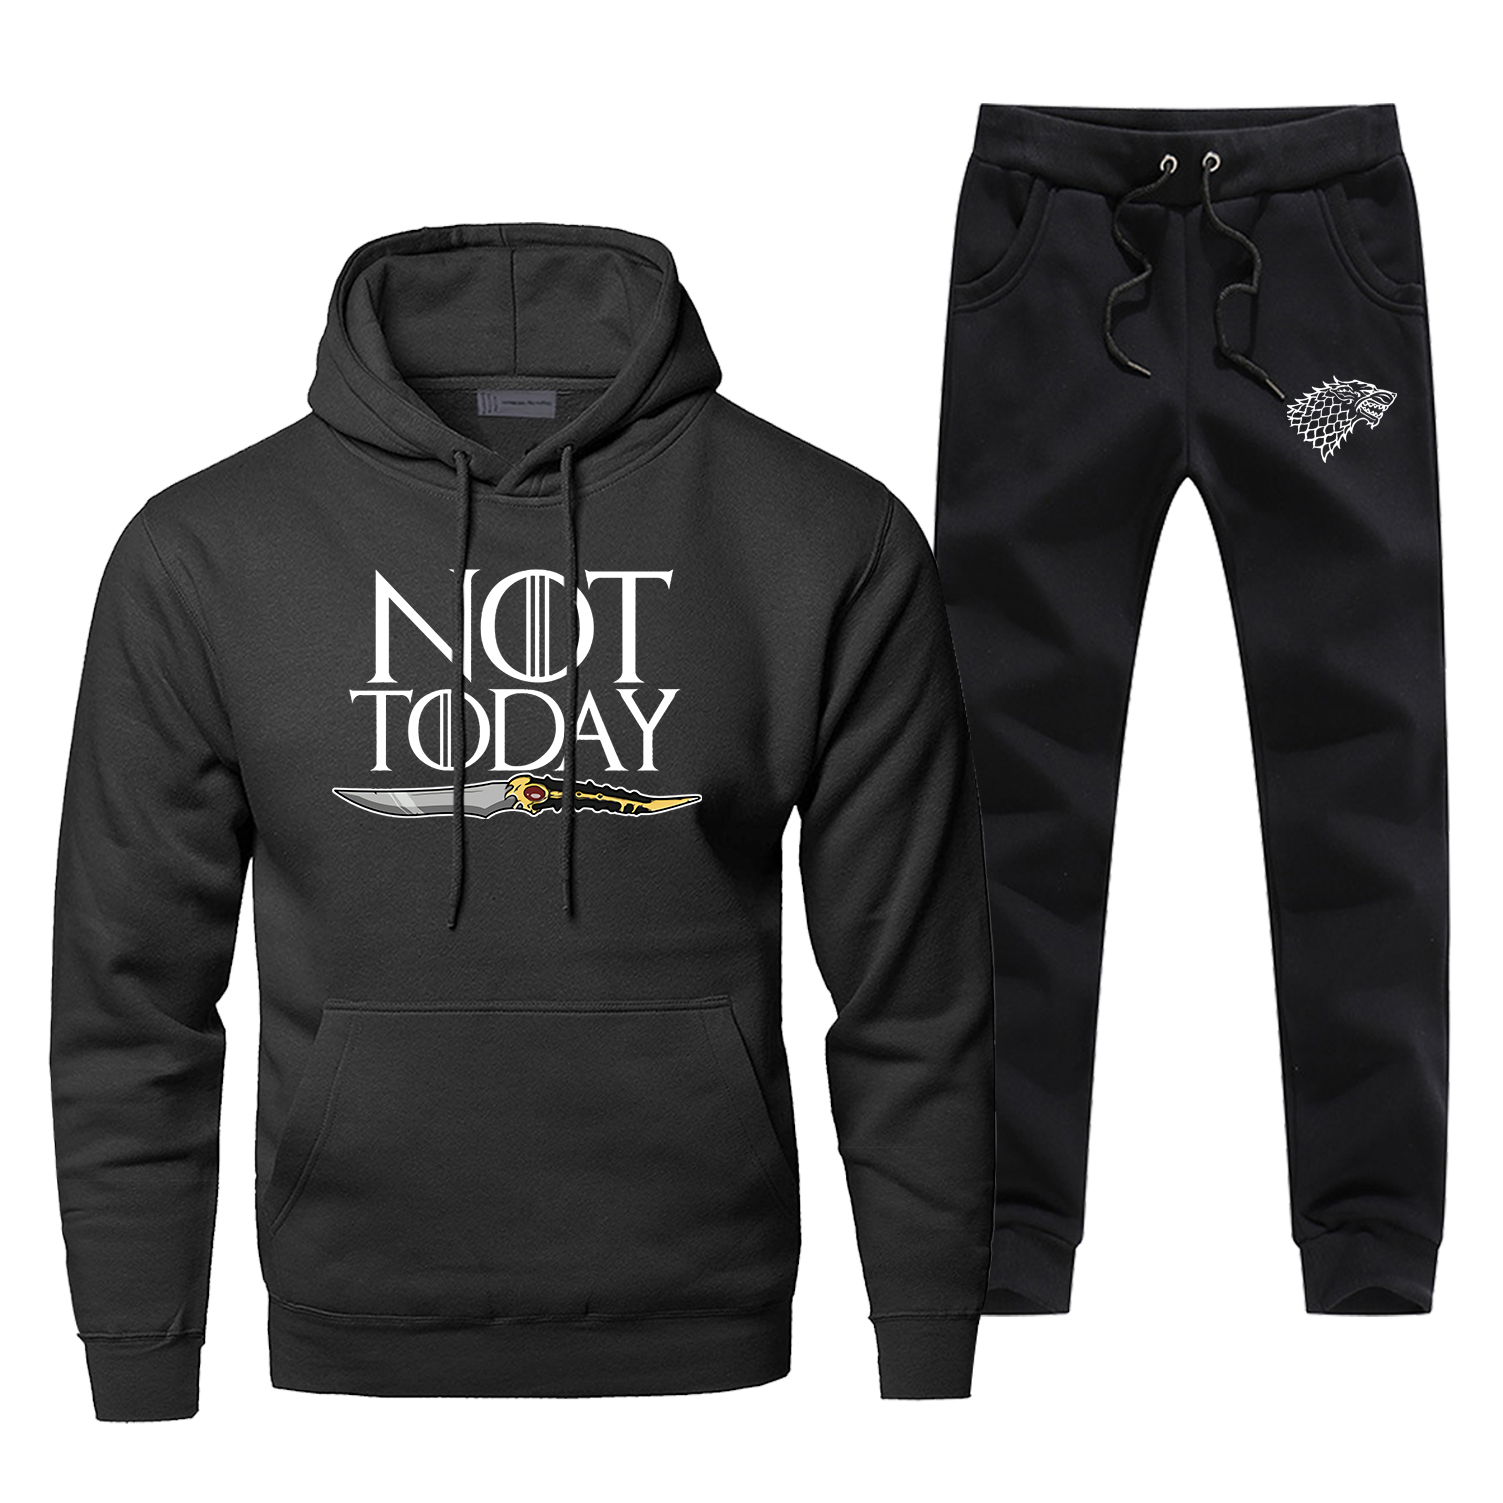 Game Of Thrones Sweatshirt Arya Stark Not Today Print Hoodies+pants Sets Men'S Fleece Hip Hop Streetwear Sportswear Sweatpants